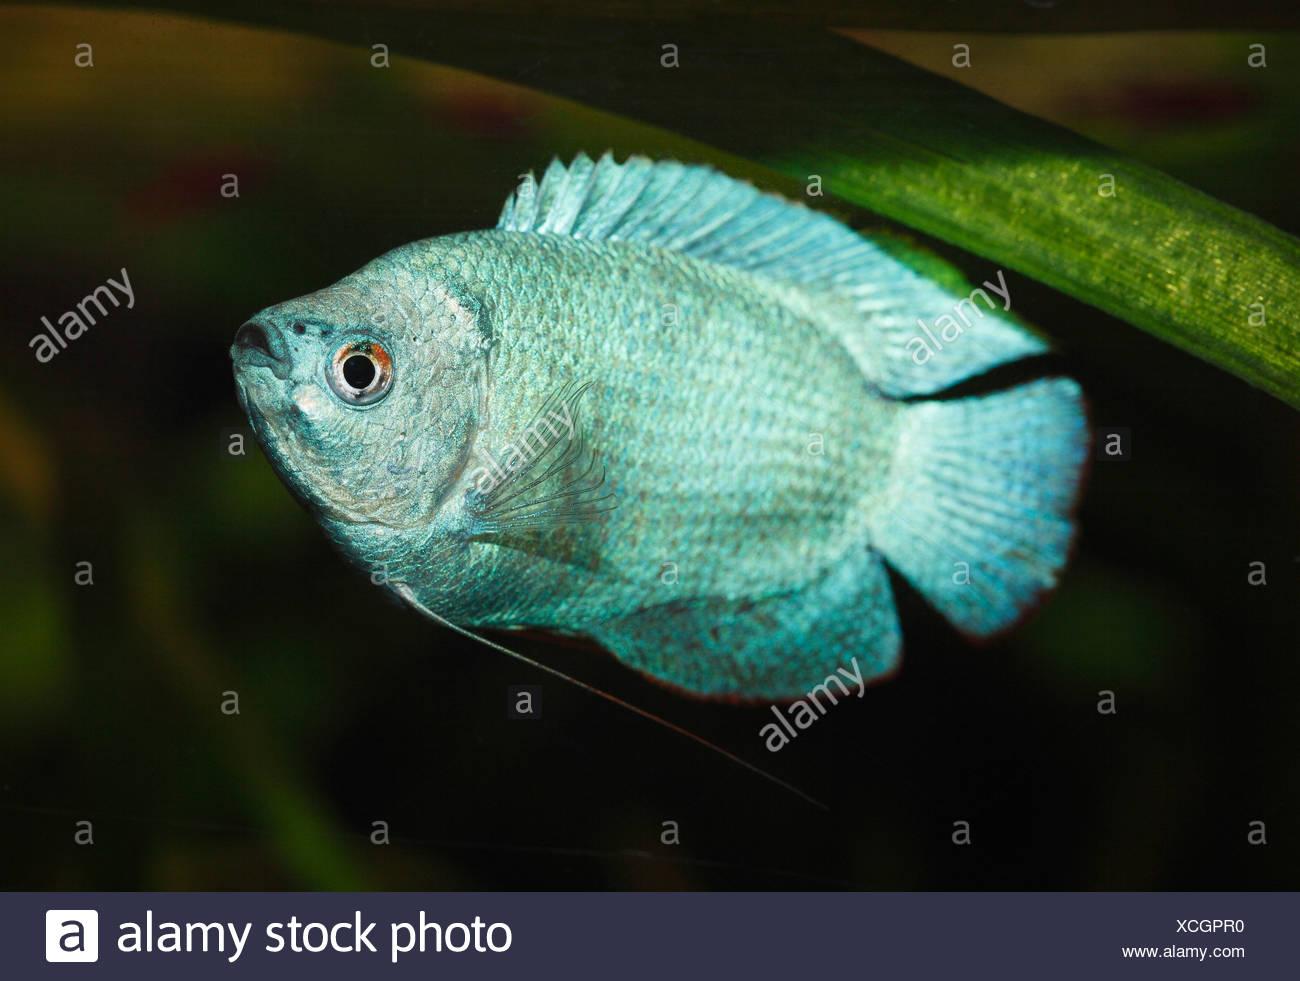 Germany, Dwarf gourami swimming in aquarium freshwater - Stock Image